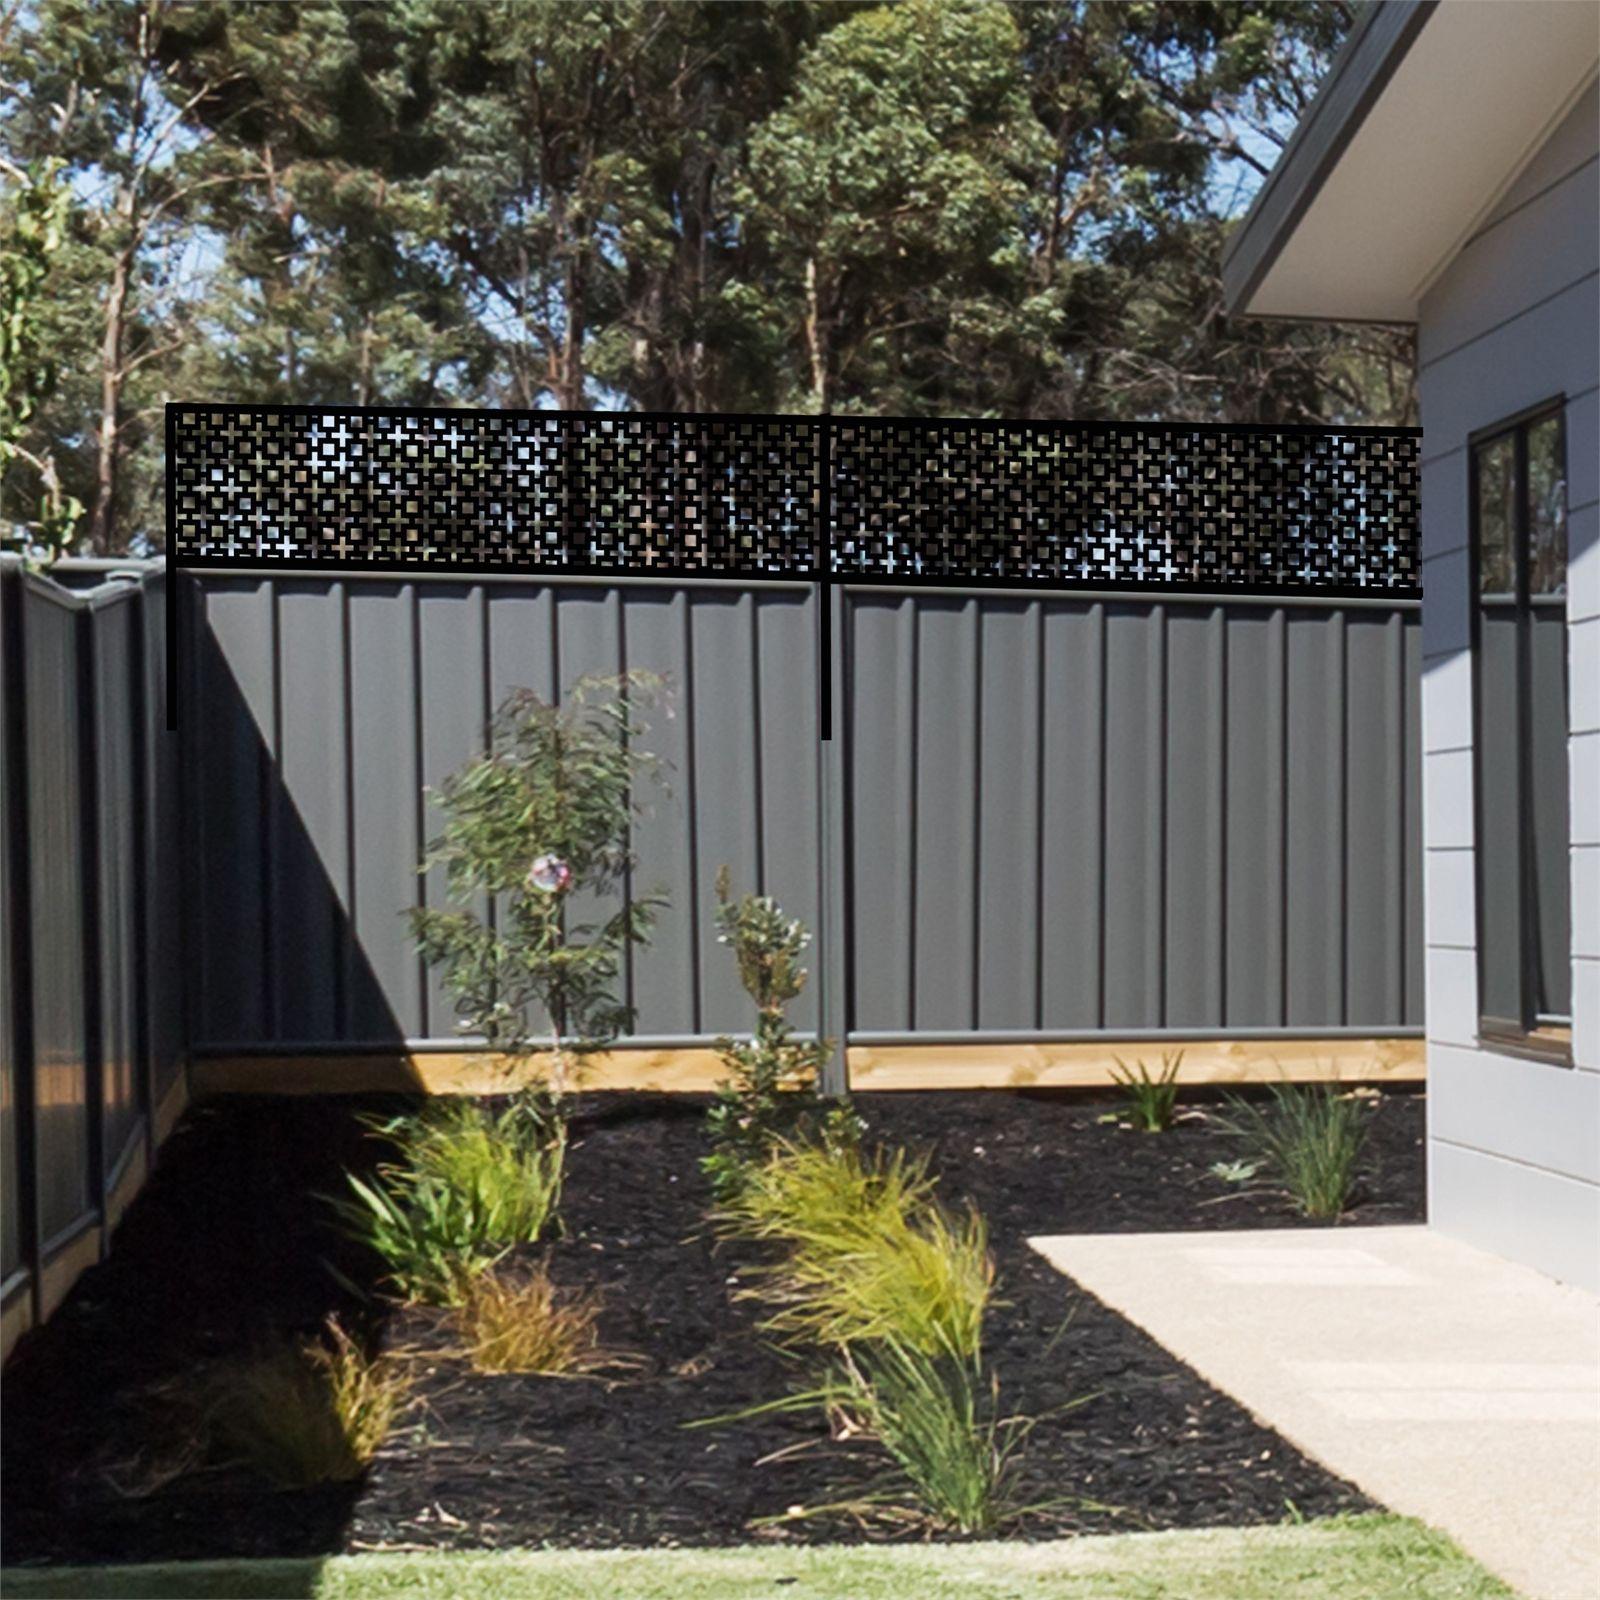 Matrix 2400 X 600mm Charcoal Sahara Fence Extension Bamboo